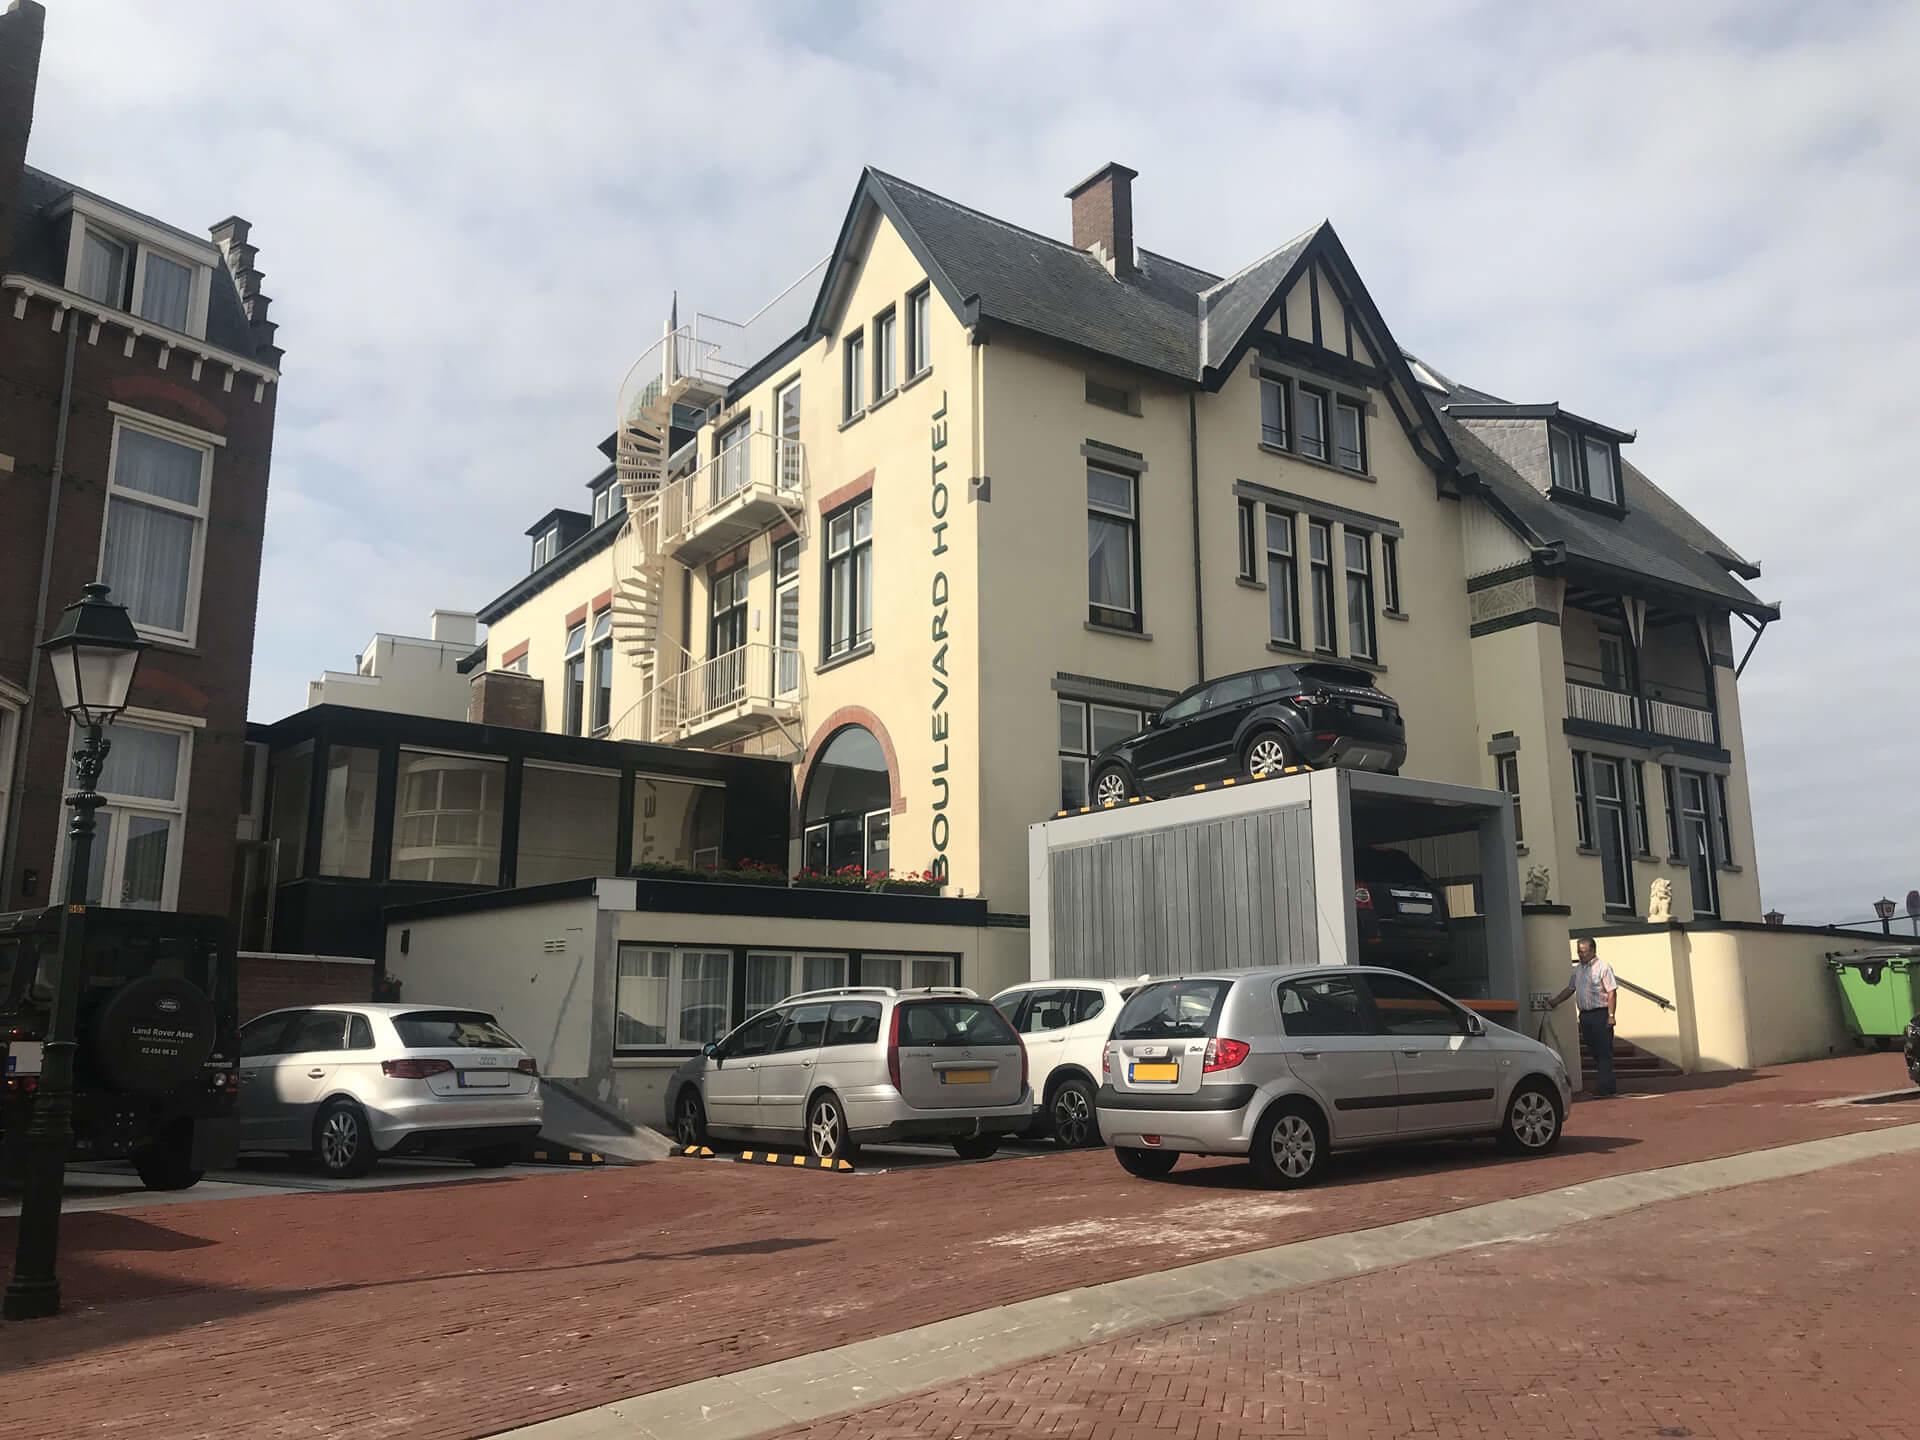 Project Parkeersysteem MultiBase U2 Scheveningen - Aarding Parking Systems 2